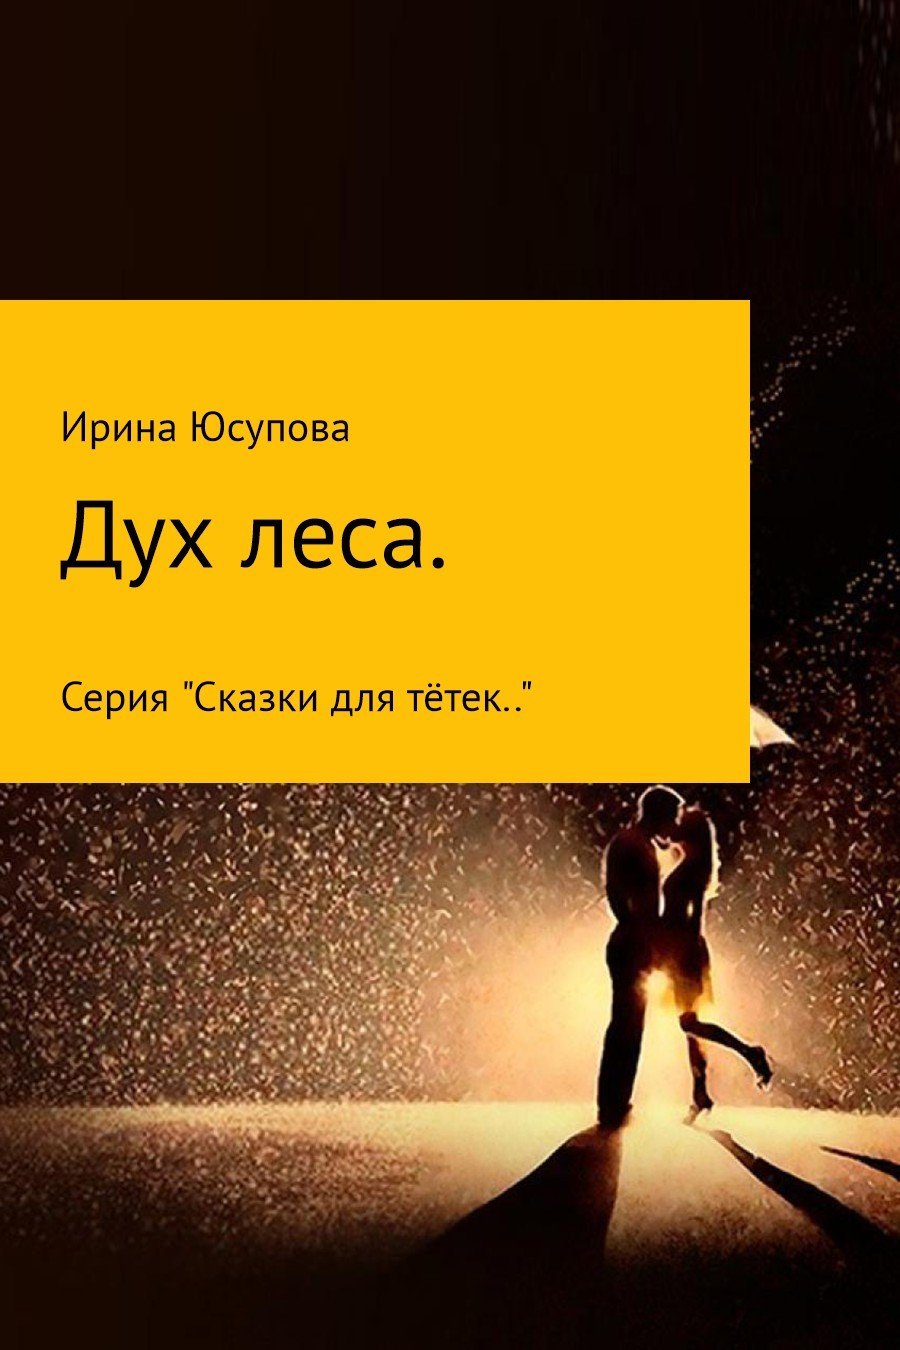 Ирина Николаевна Юсупова Дух леса комлев и ковыль